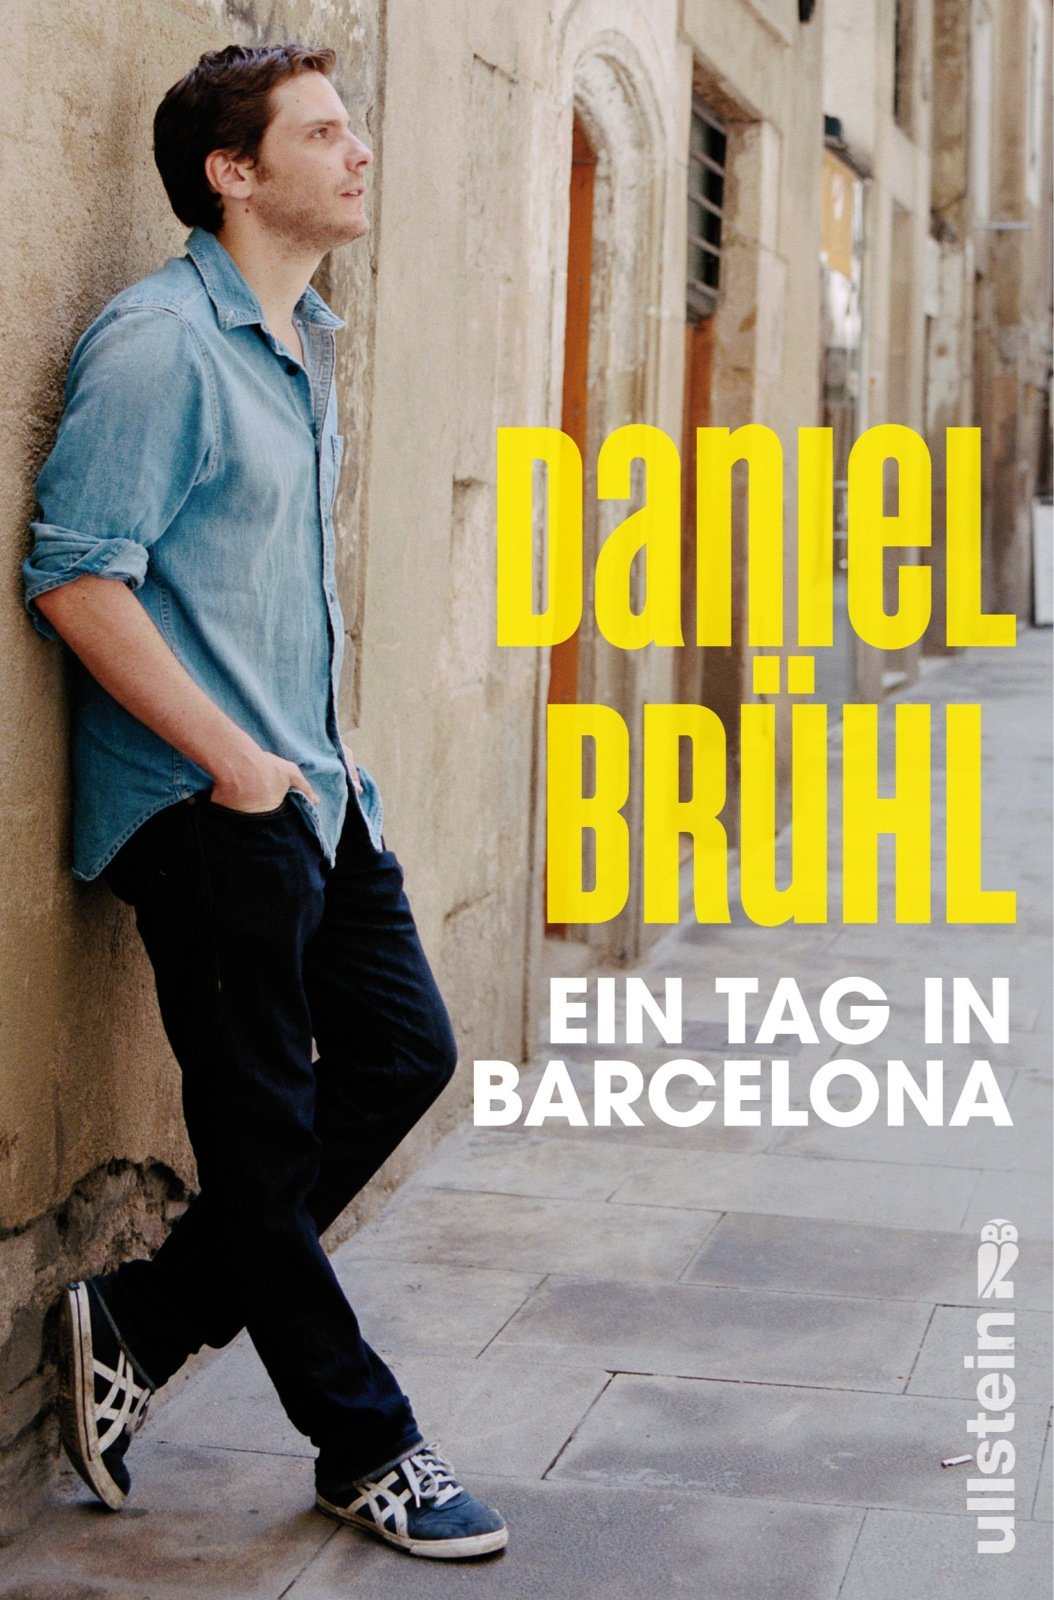 Ein Tag in Barcelona Gebundenes Buch – 14. September 2012 Daniel Brühl Javier Cáceres Ullstein Hardcover 3550088329